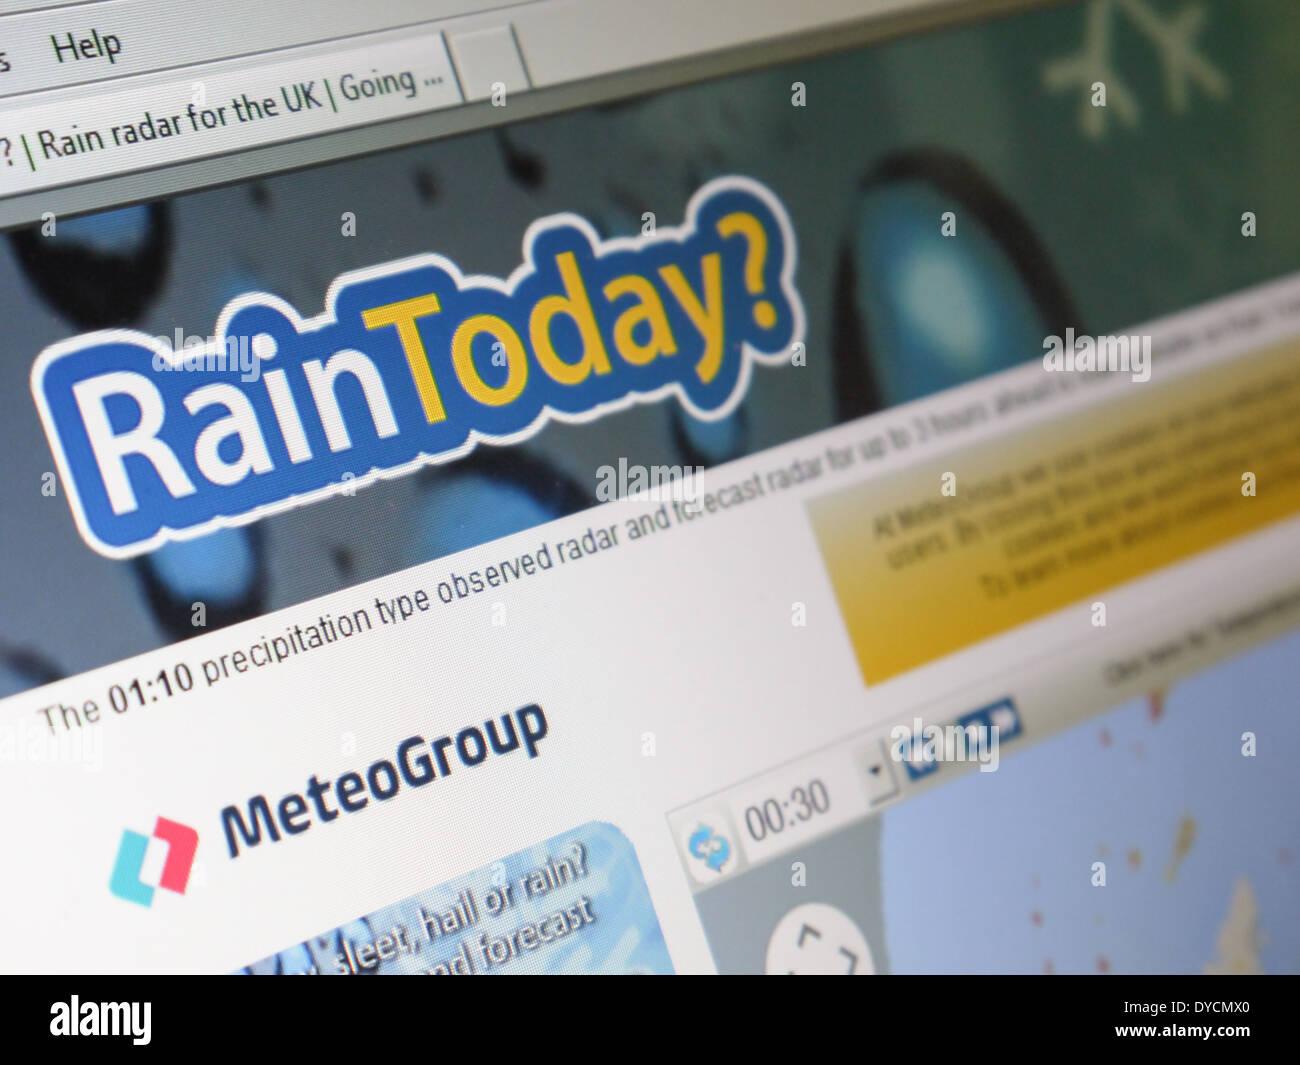 raintoday weather forecast - Stock Image